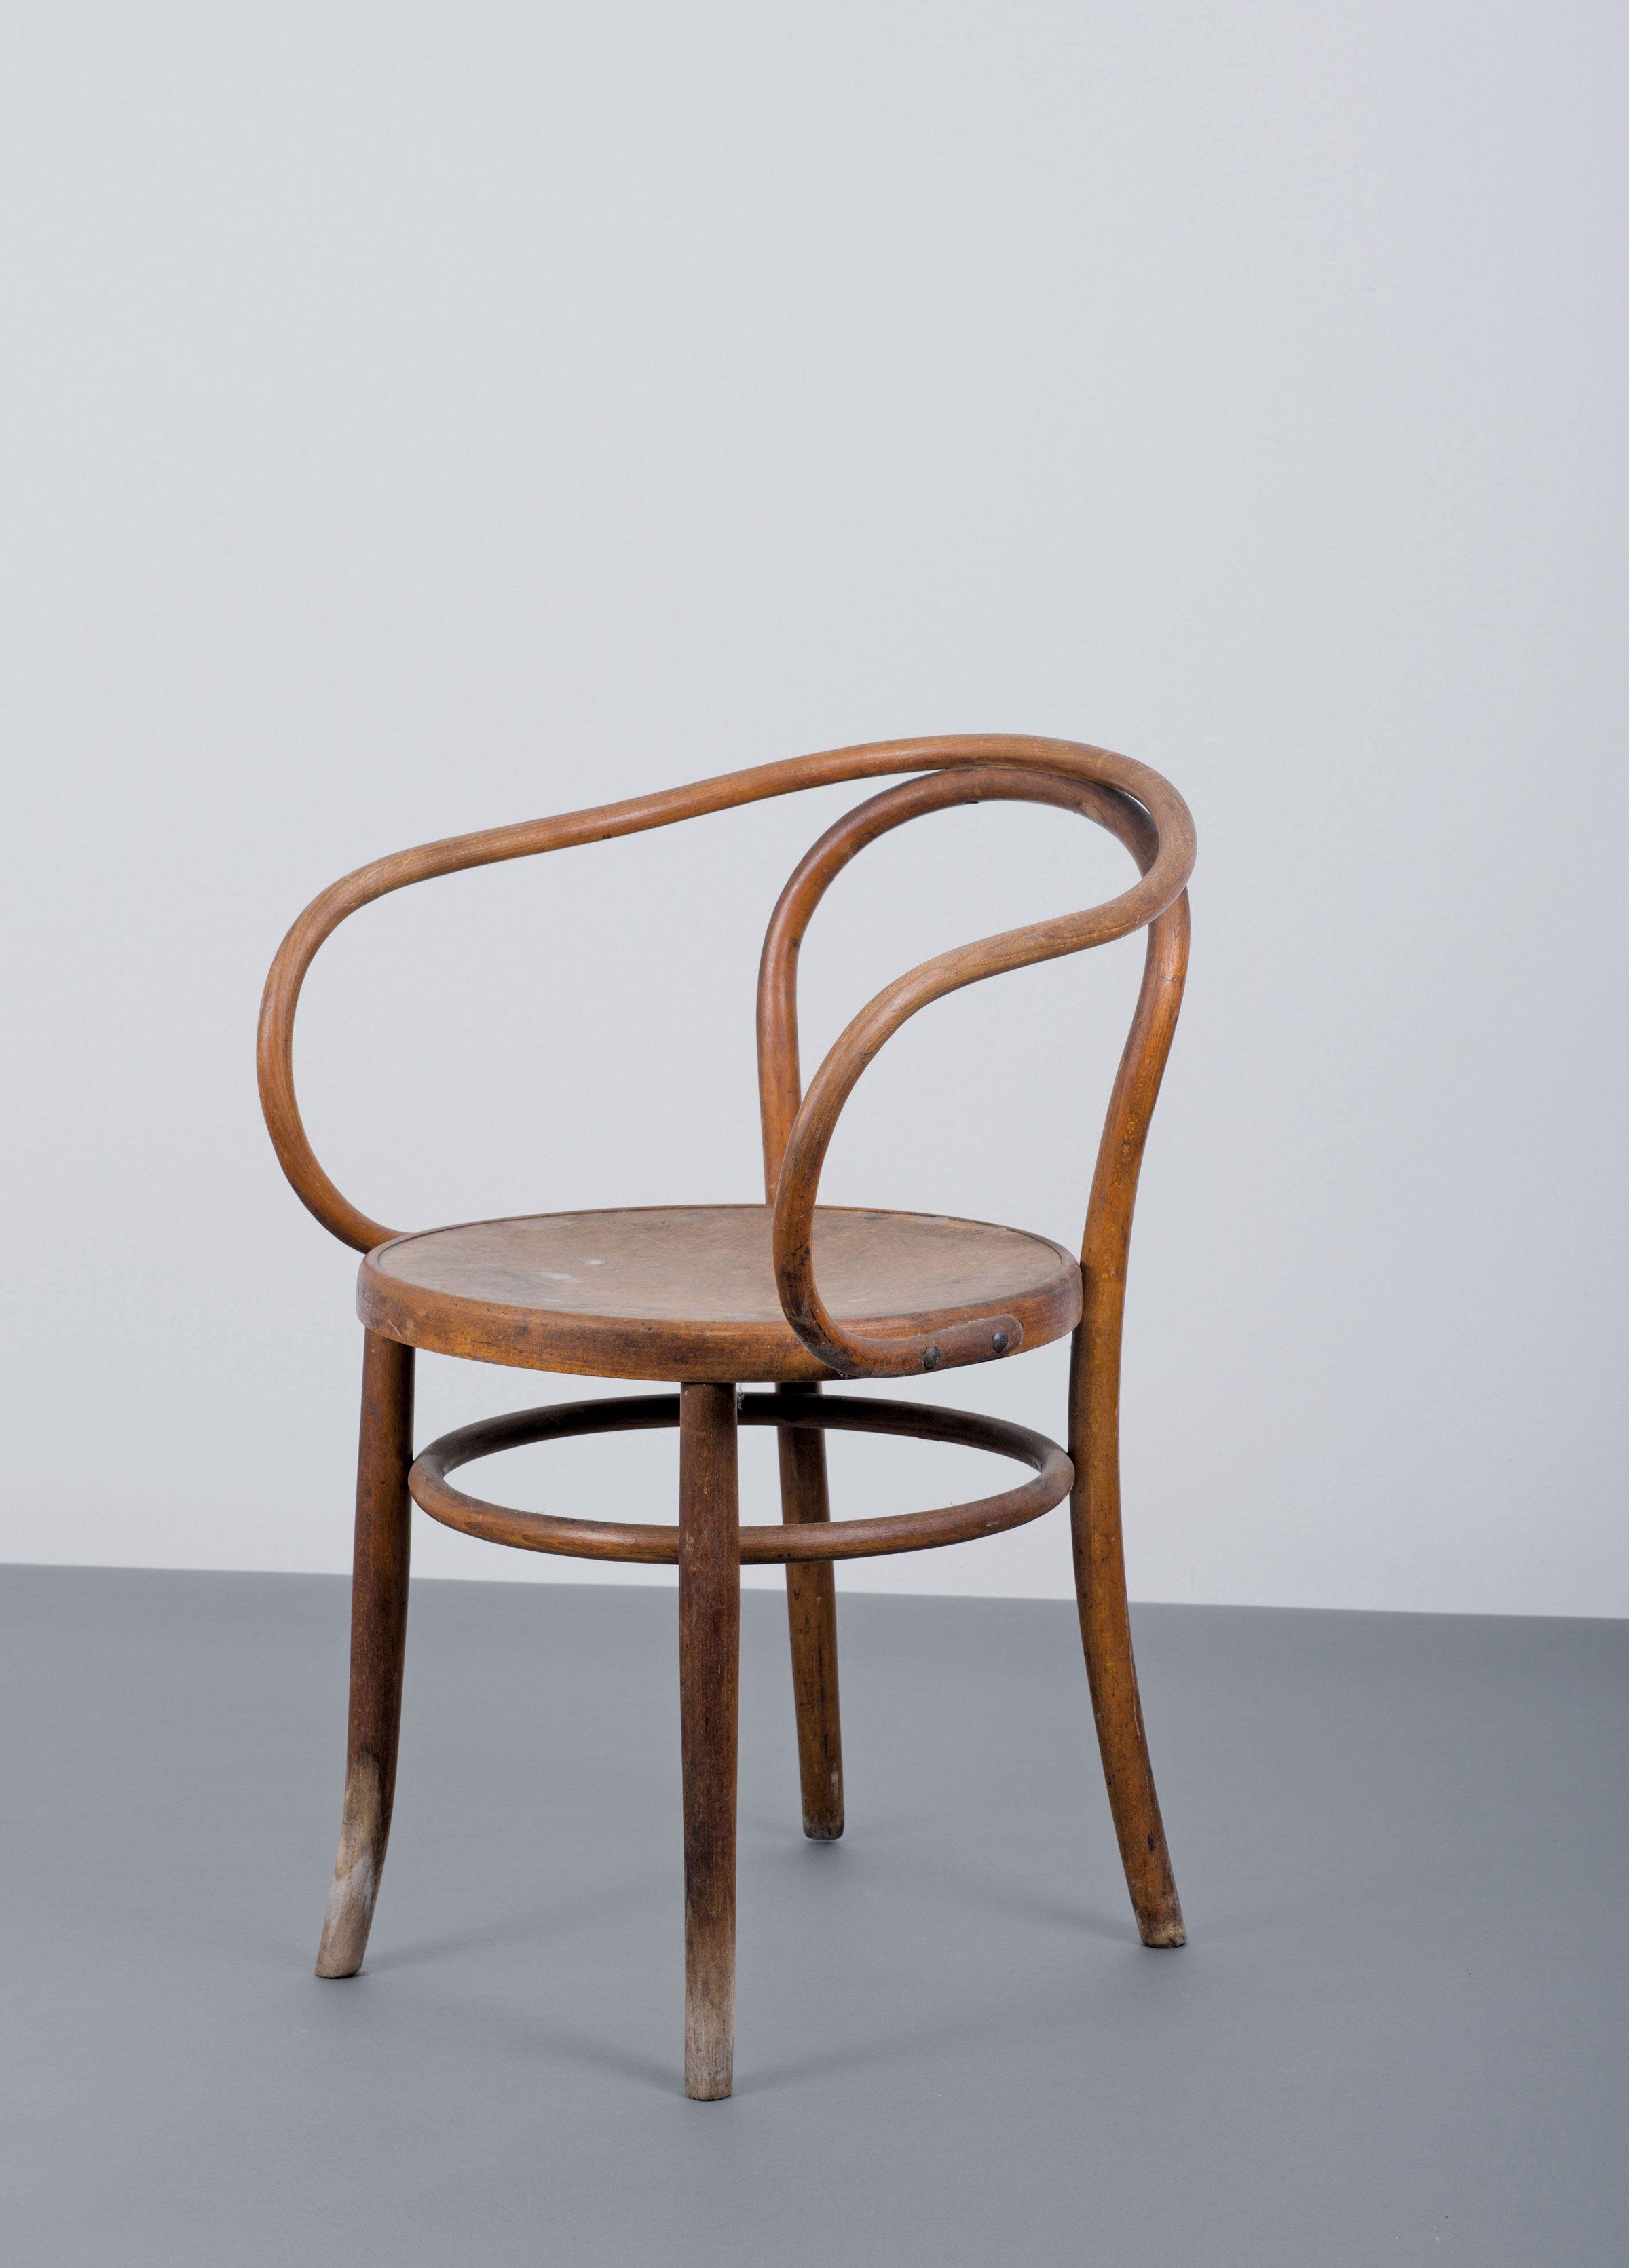 Thonet 209 Stuhl Design Stuhle